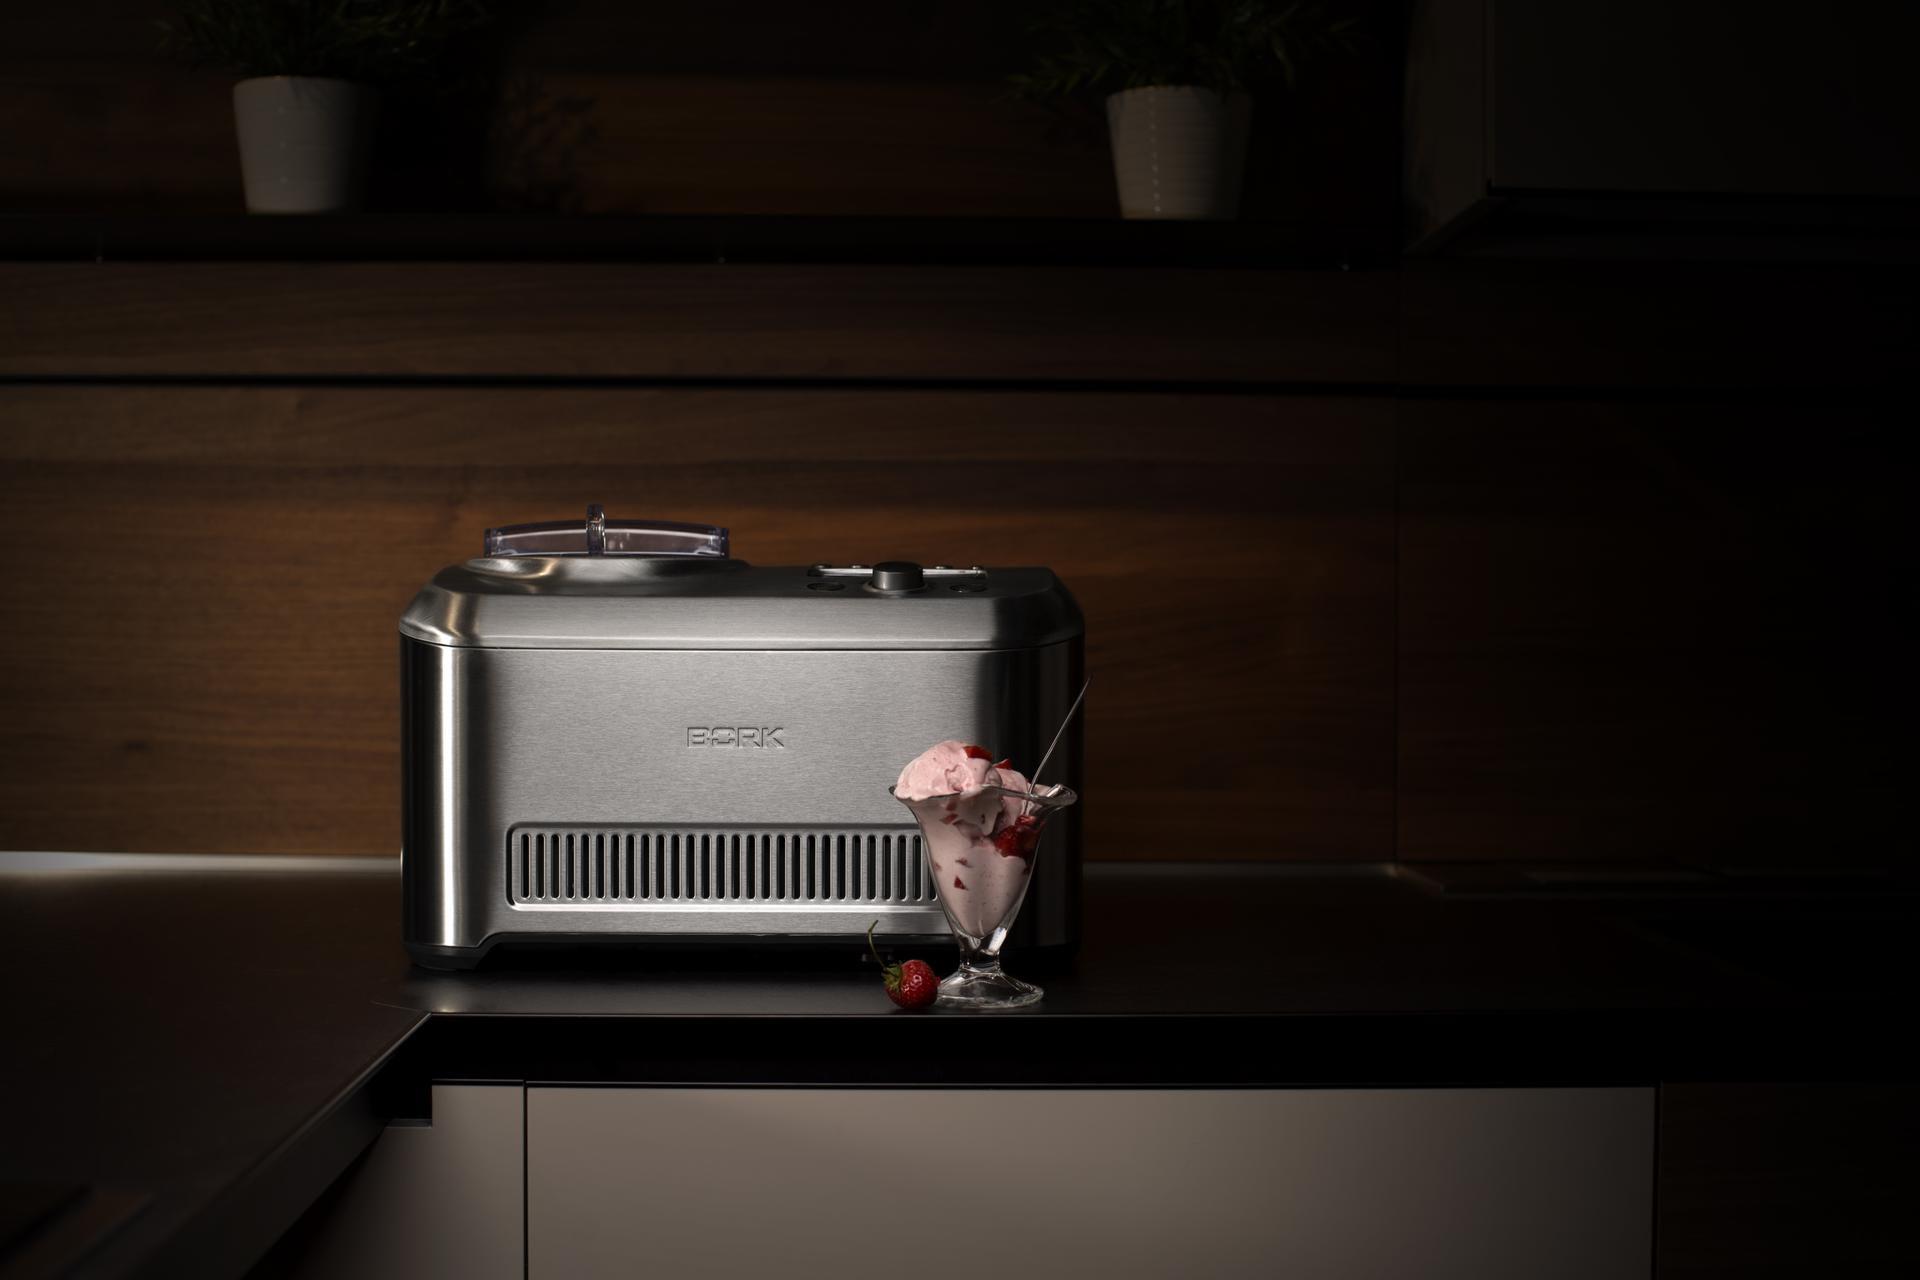 Мороженица BORK E801 поступает впродажу